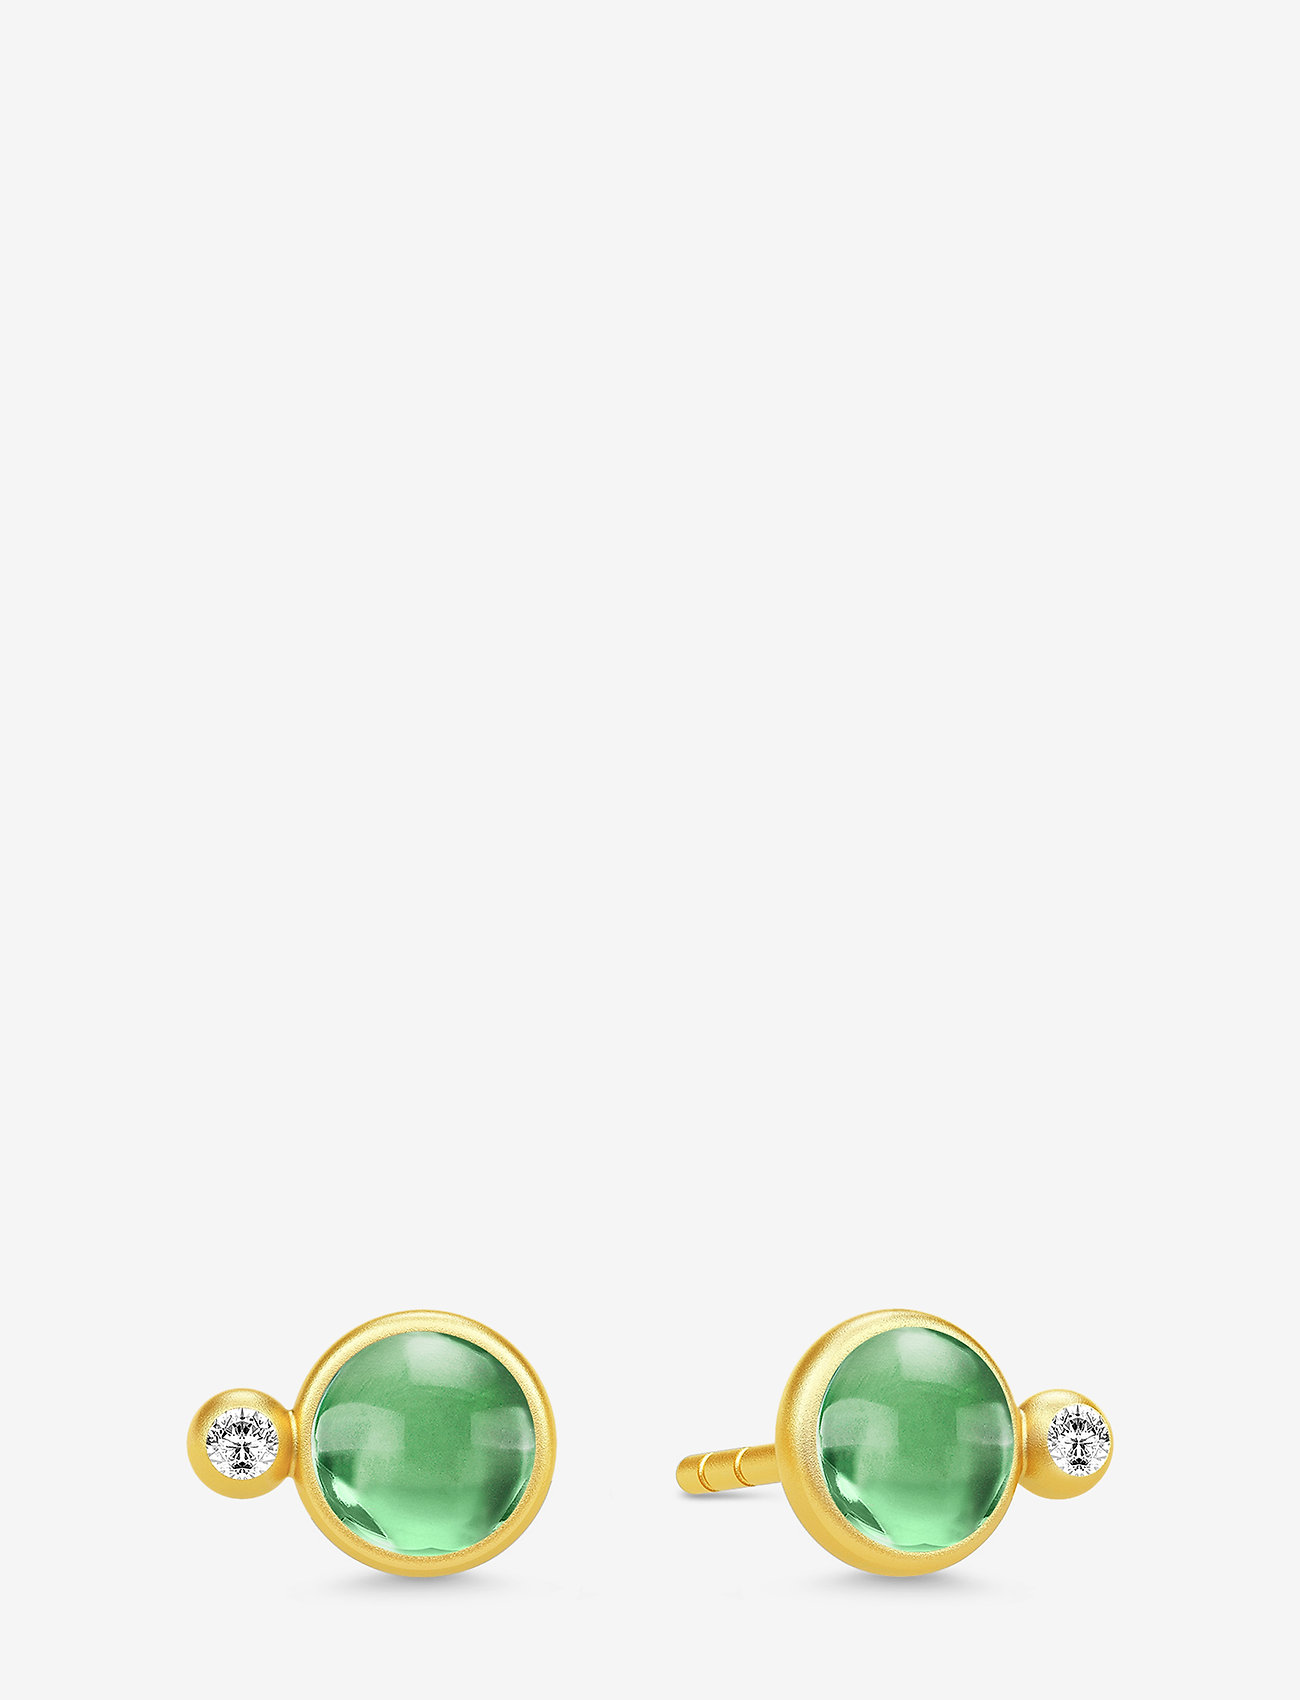 Julie Sandlau - Prime Earstuds - Gold/Green - studs - rhodium /clear - 0